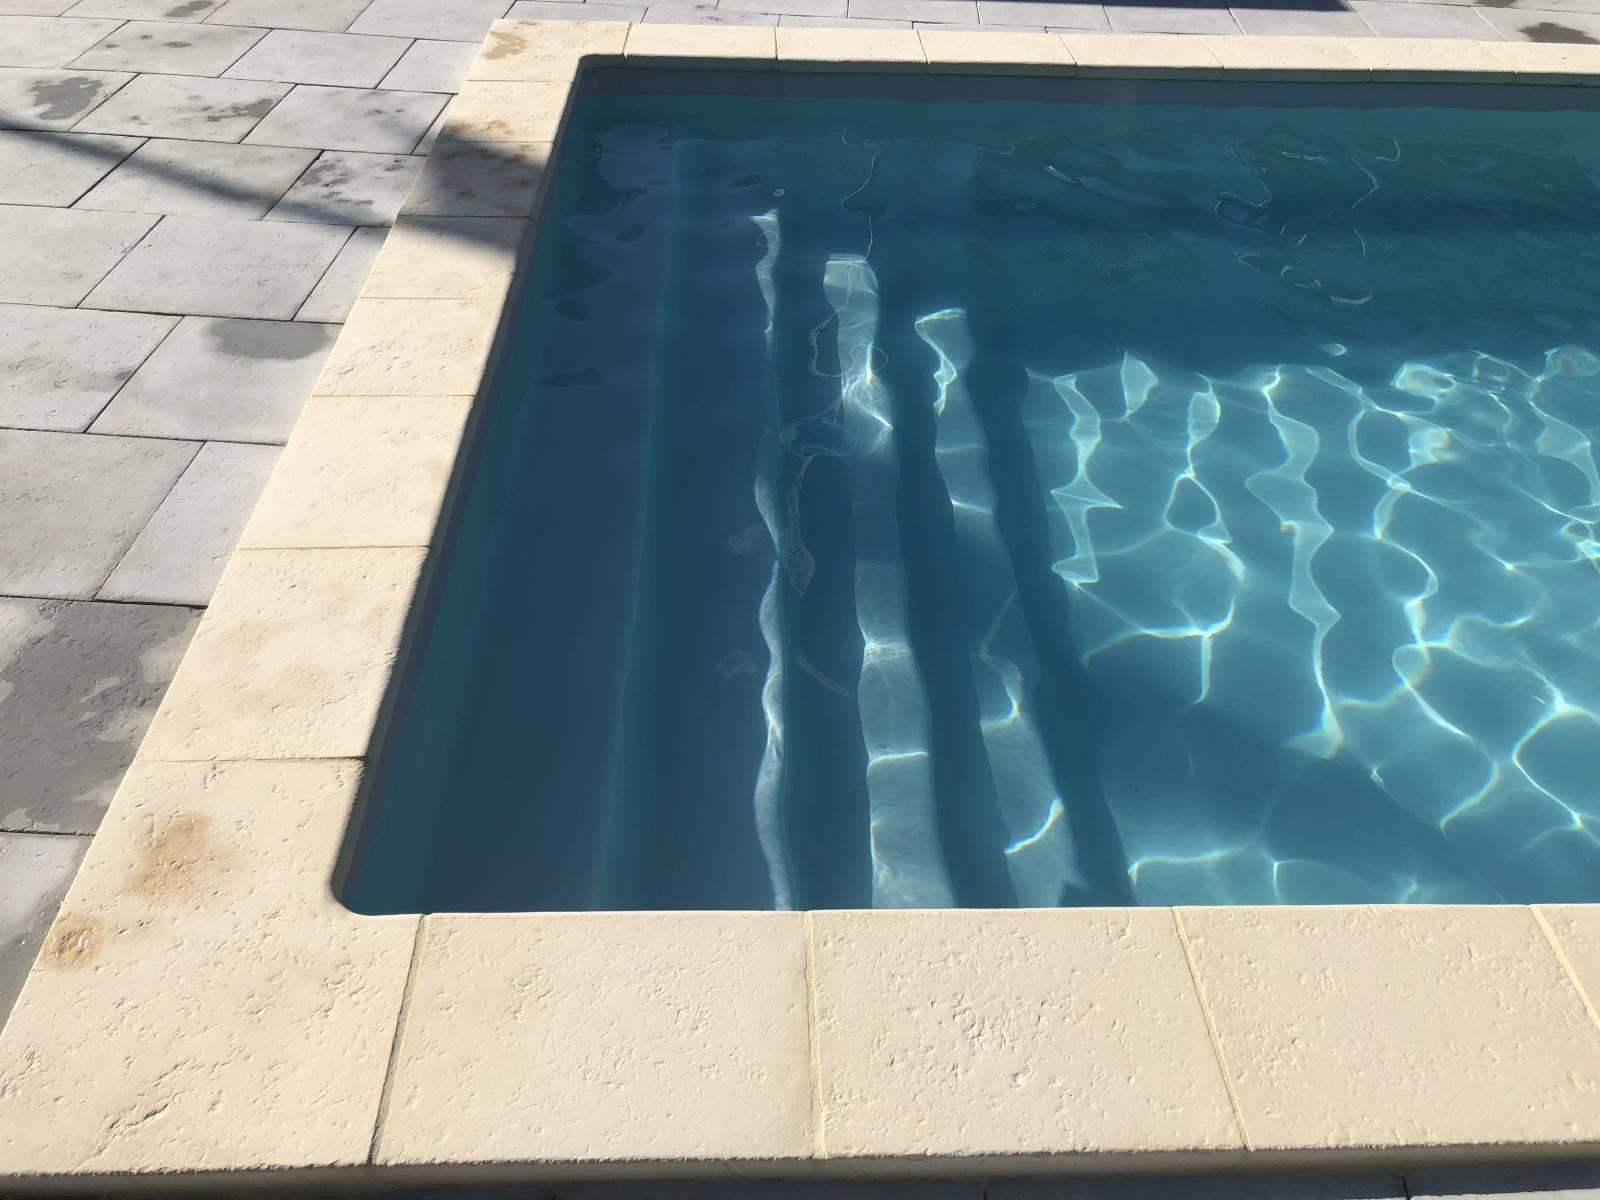 cobalt la piscine fond plat avec grand escalier. Black Bedroom Furniture Sets. Home Design Ideas